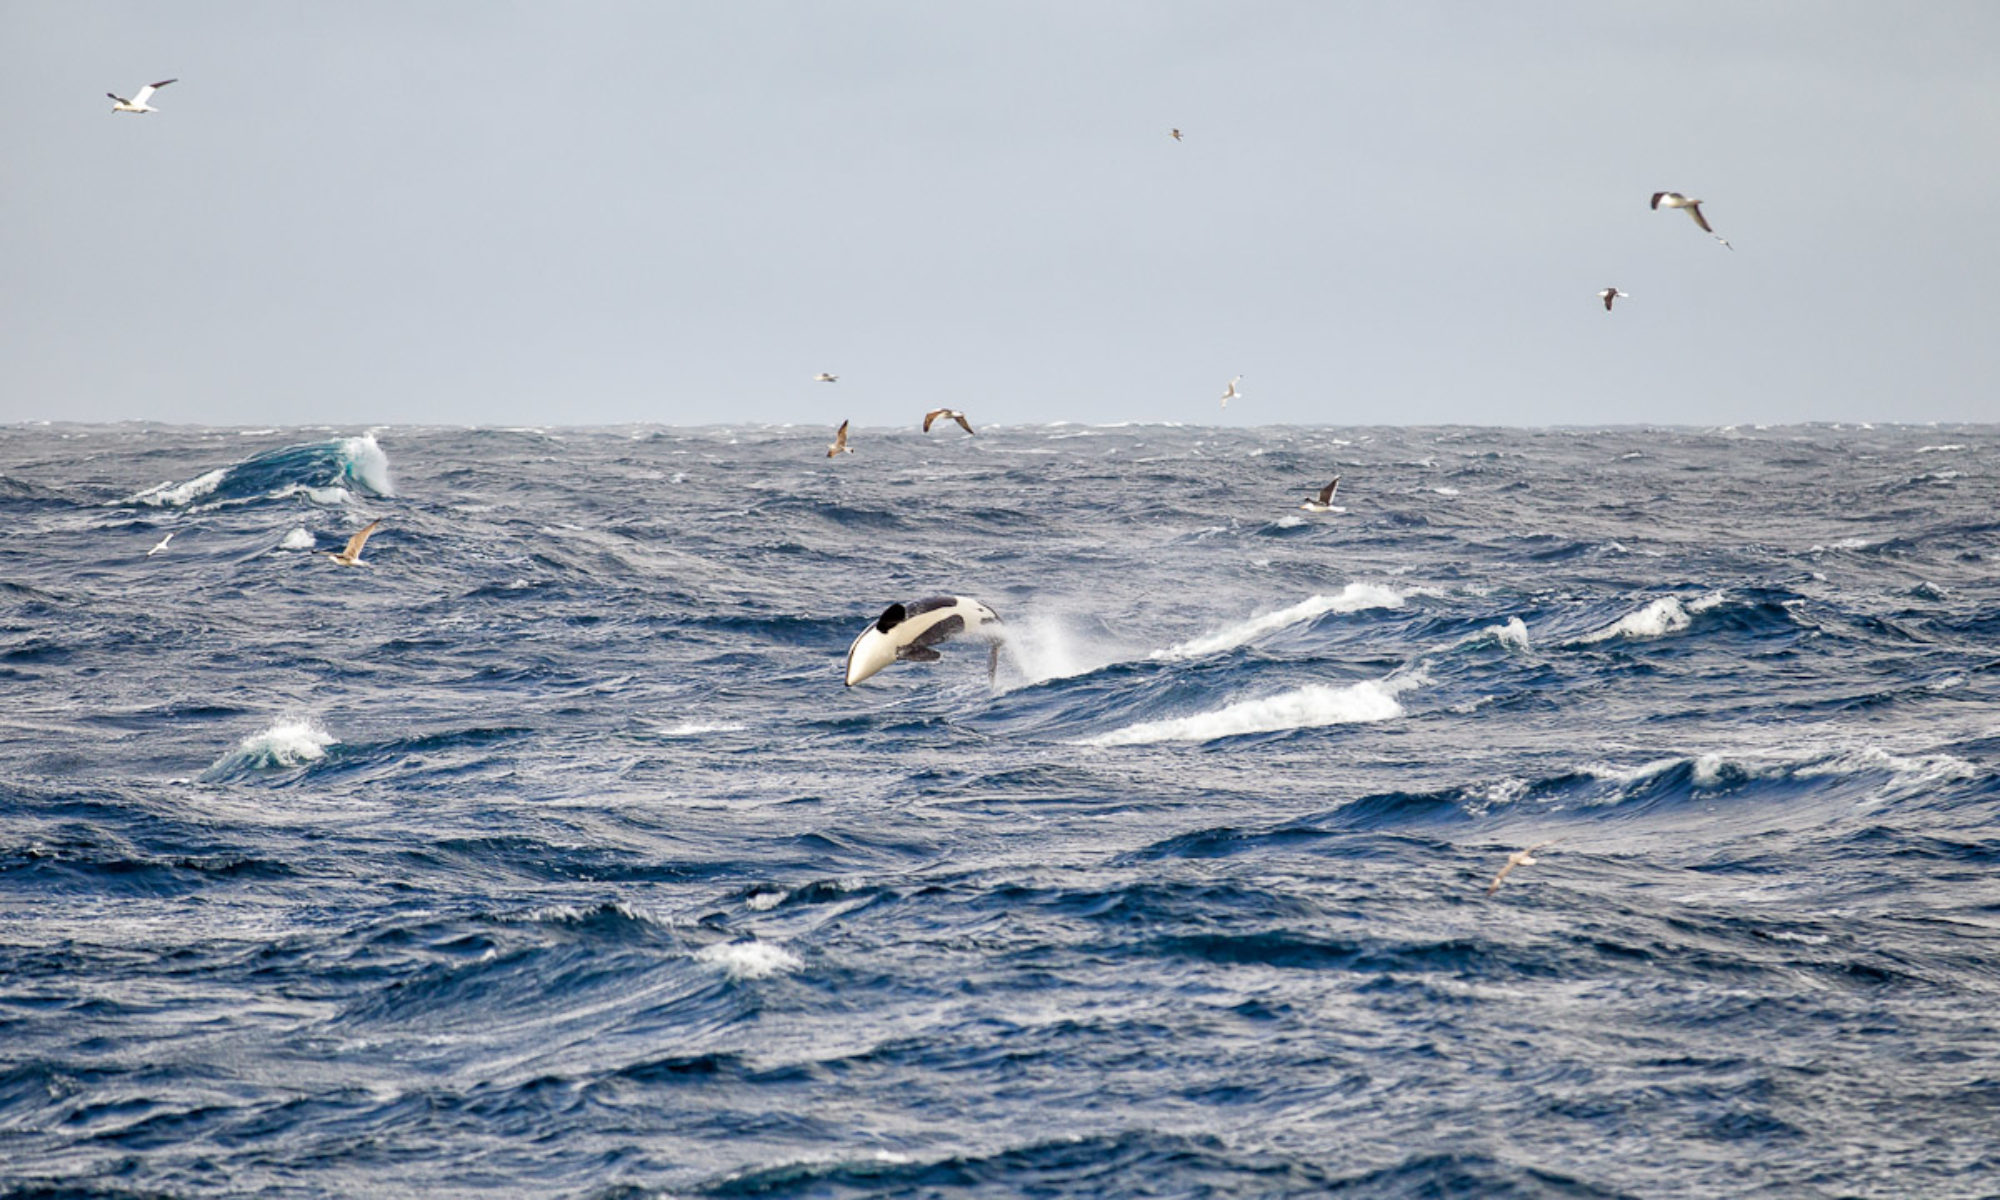 Keep Whales Wild